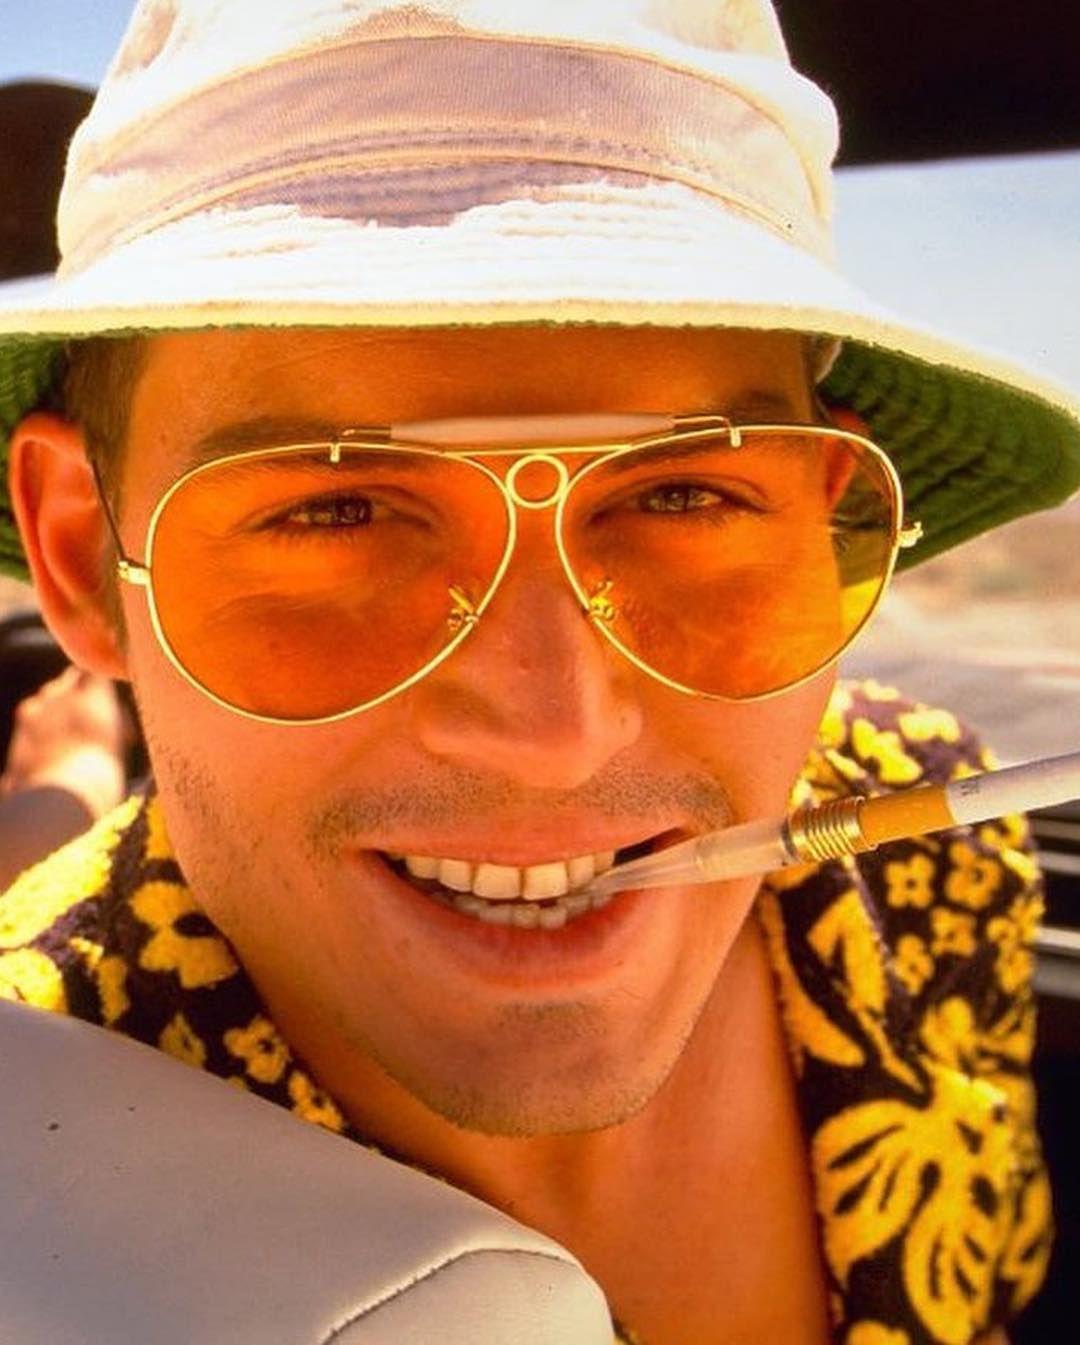 Las Vegas Parano Johnny Depp : vegas, parano, johnny, Thoughts, Film???, What's, Favorite, Johnny, Performance??, ⚡️Fear, Loathing, Vegas(1998), ⚡️Direc…, Vegas, Parano,, Marathon, Film,, Parano